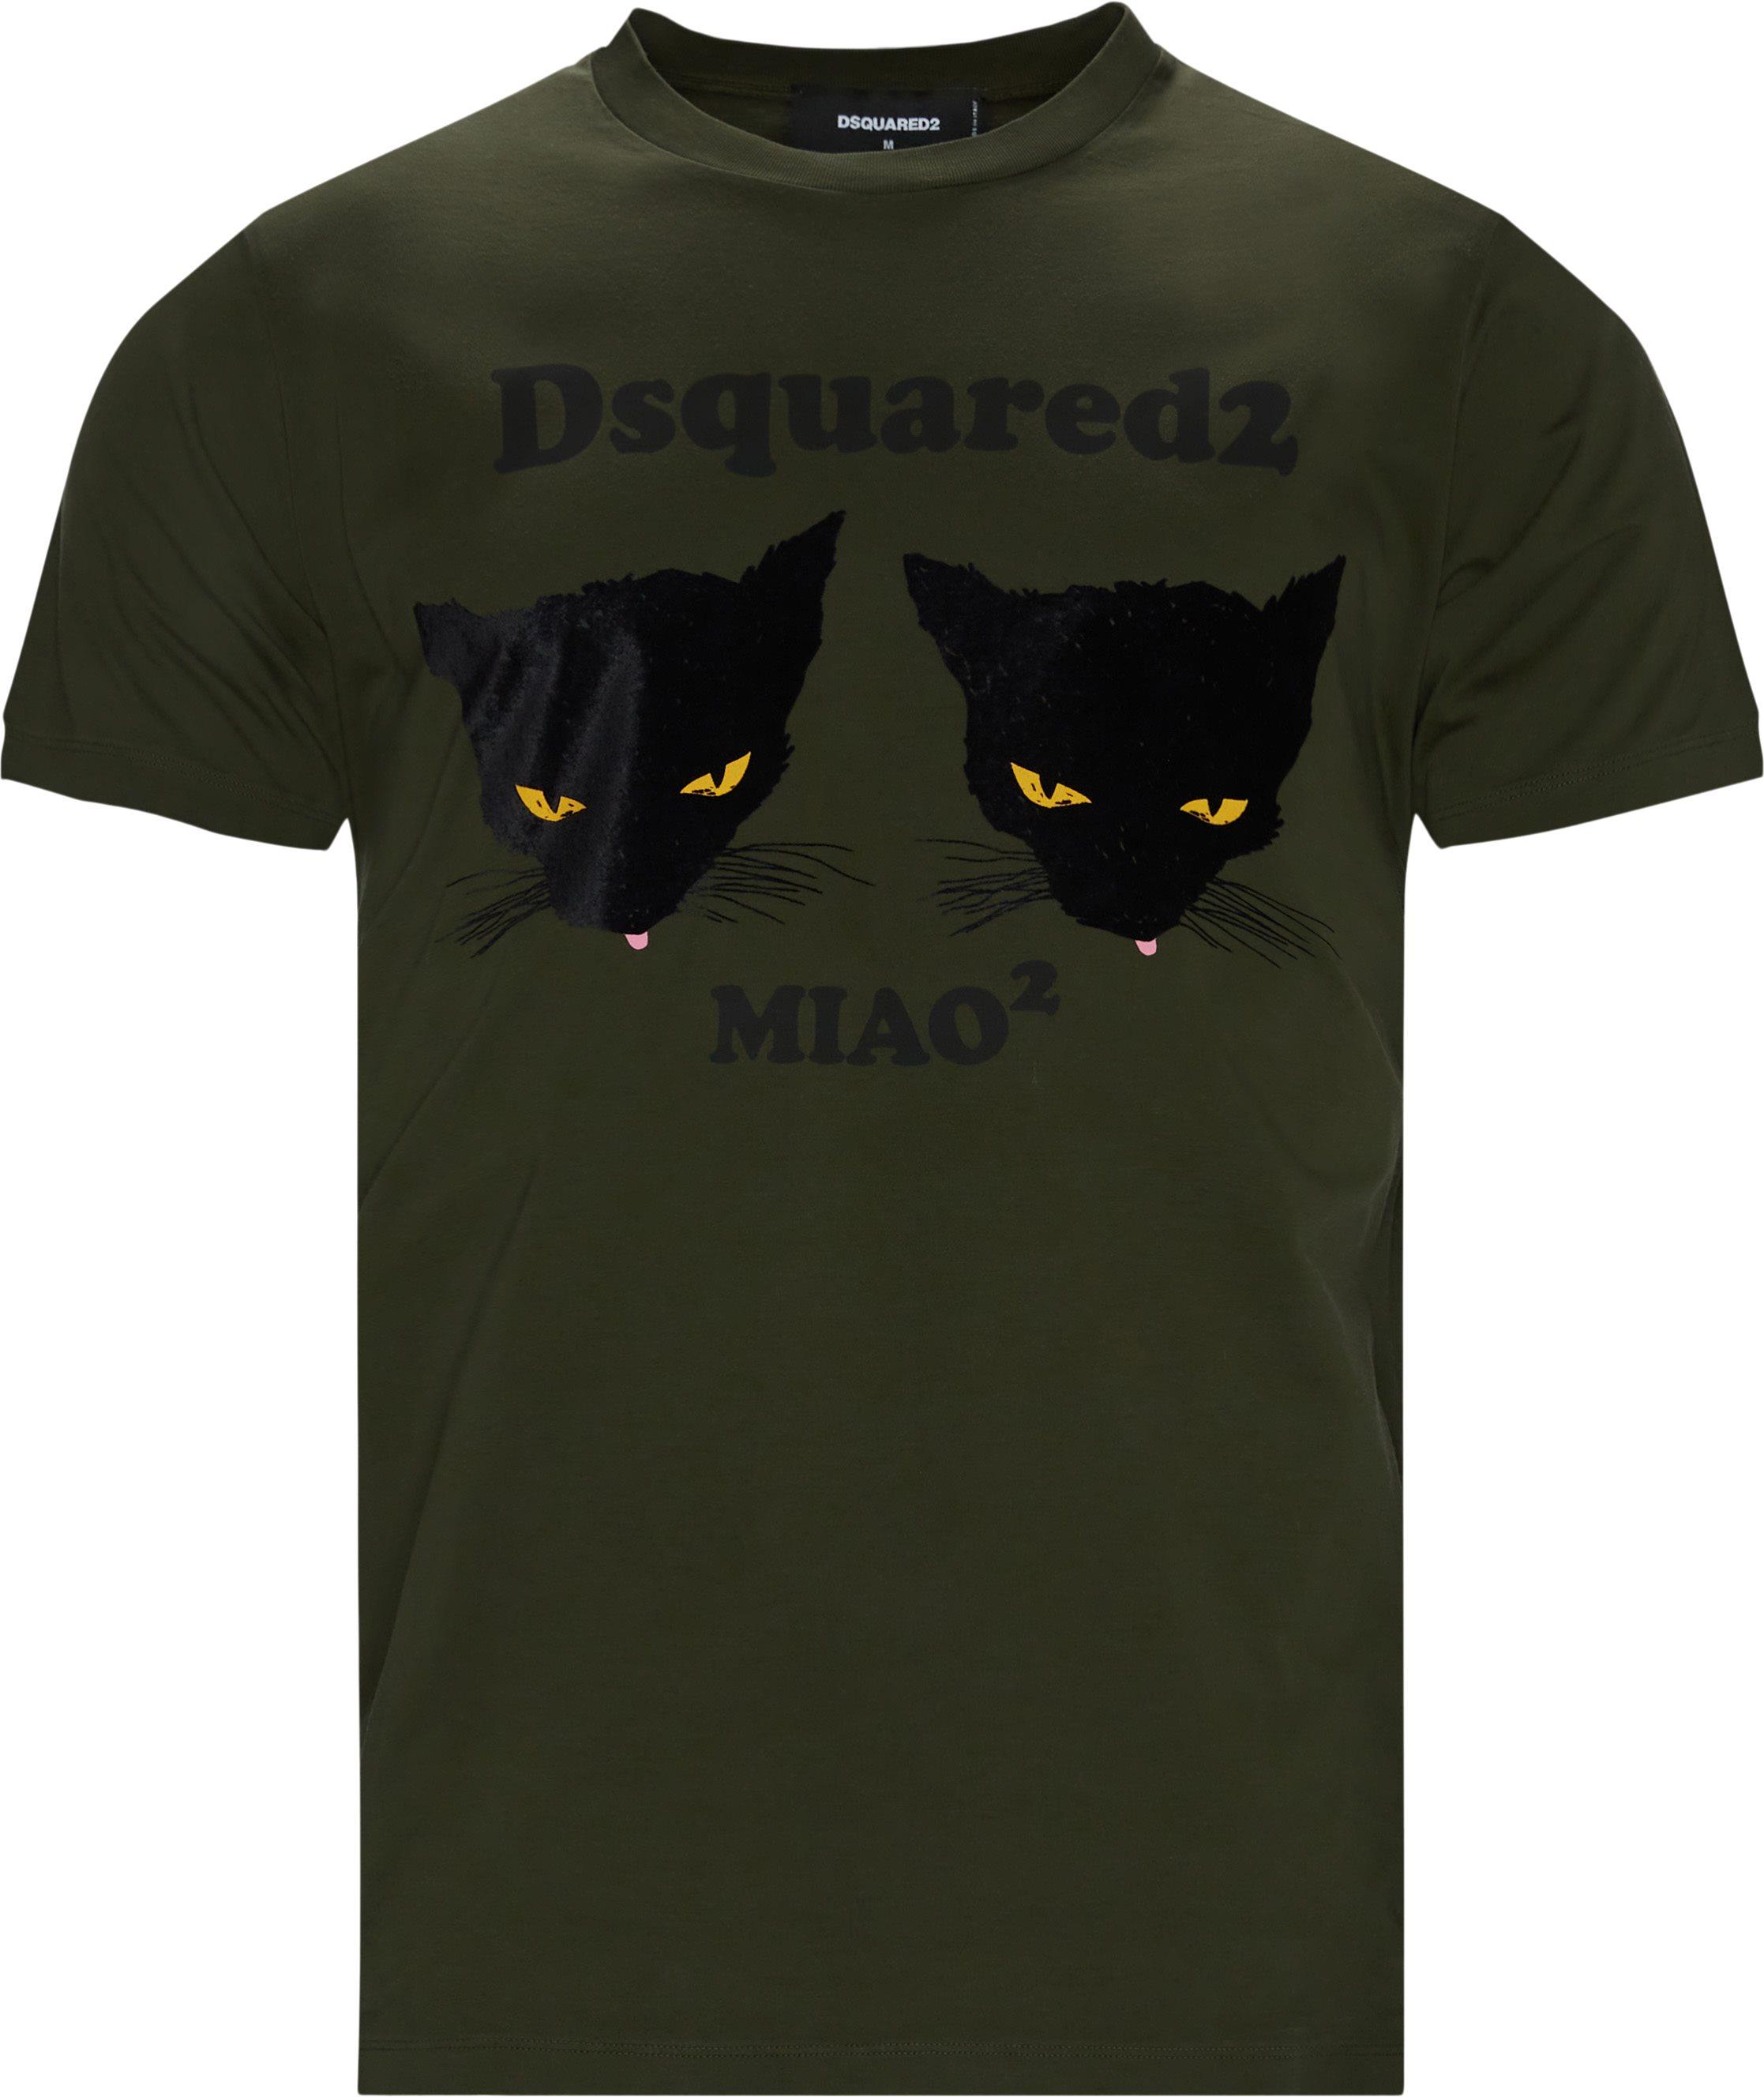 Print Tee - T-shirts - Regular fit - Army